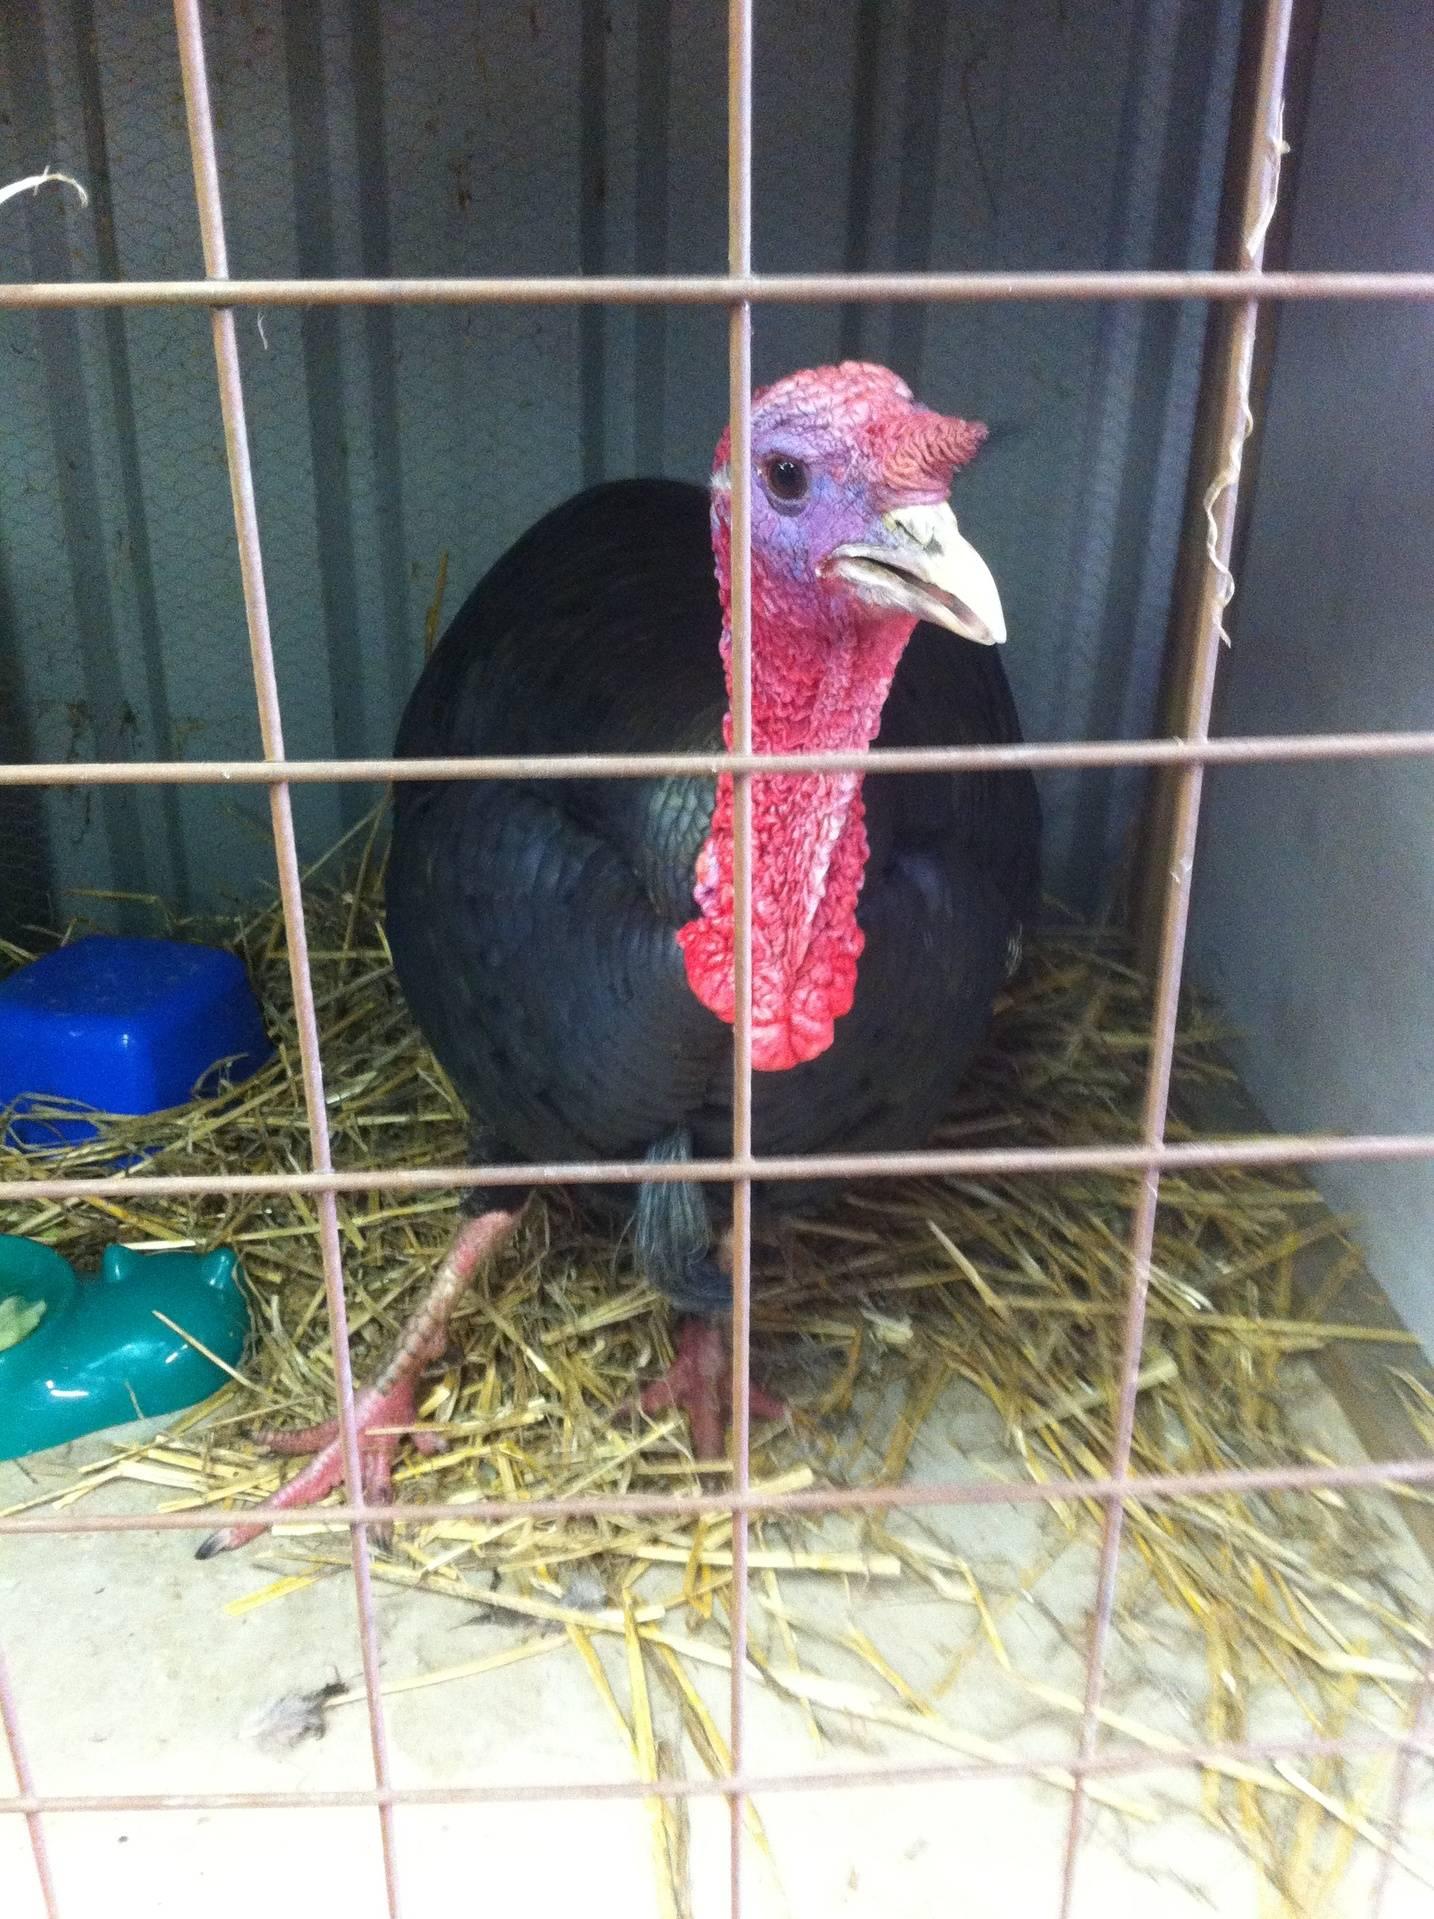 Poultry exhibits